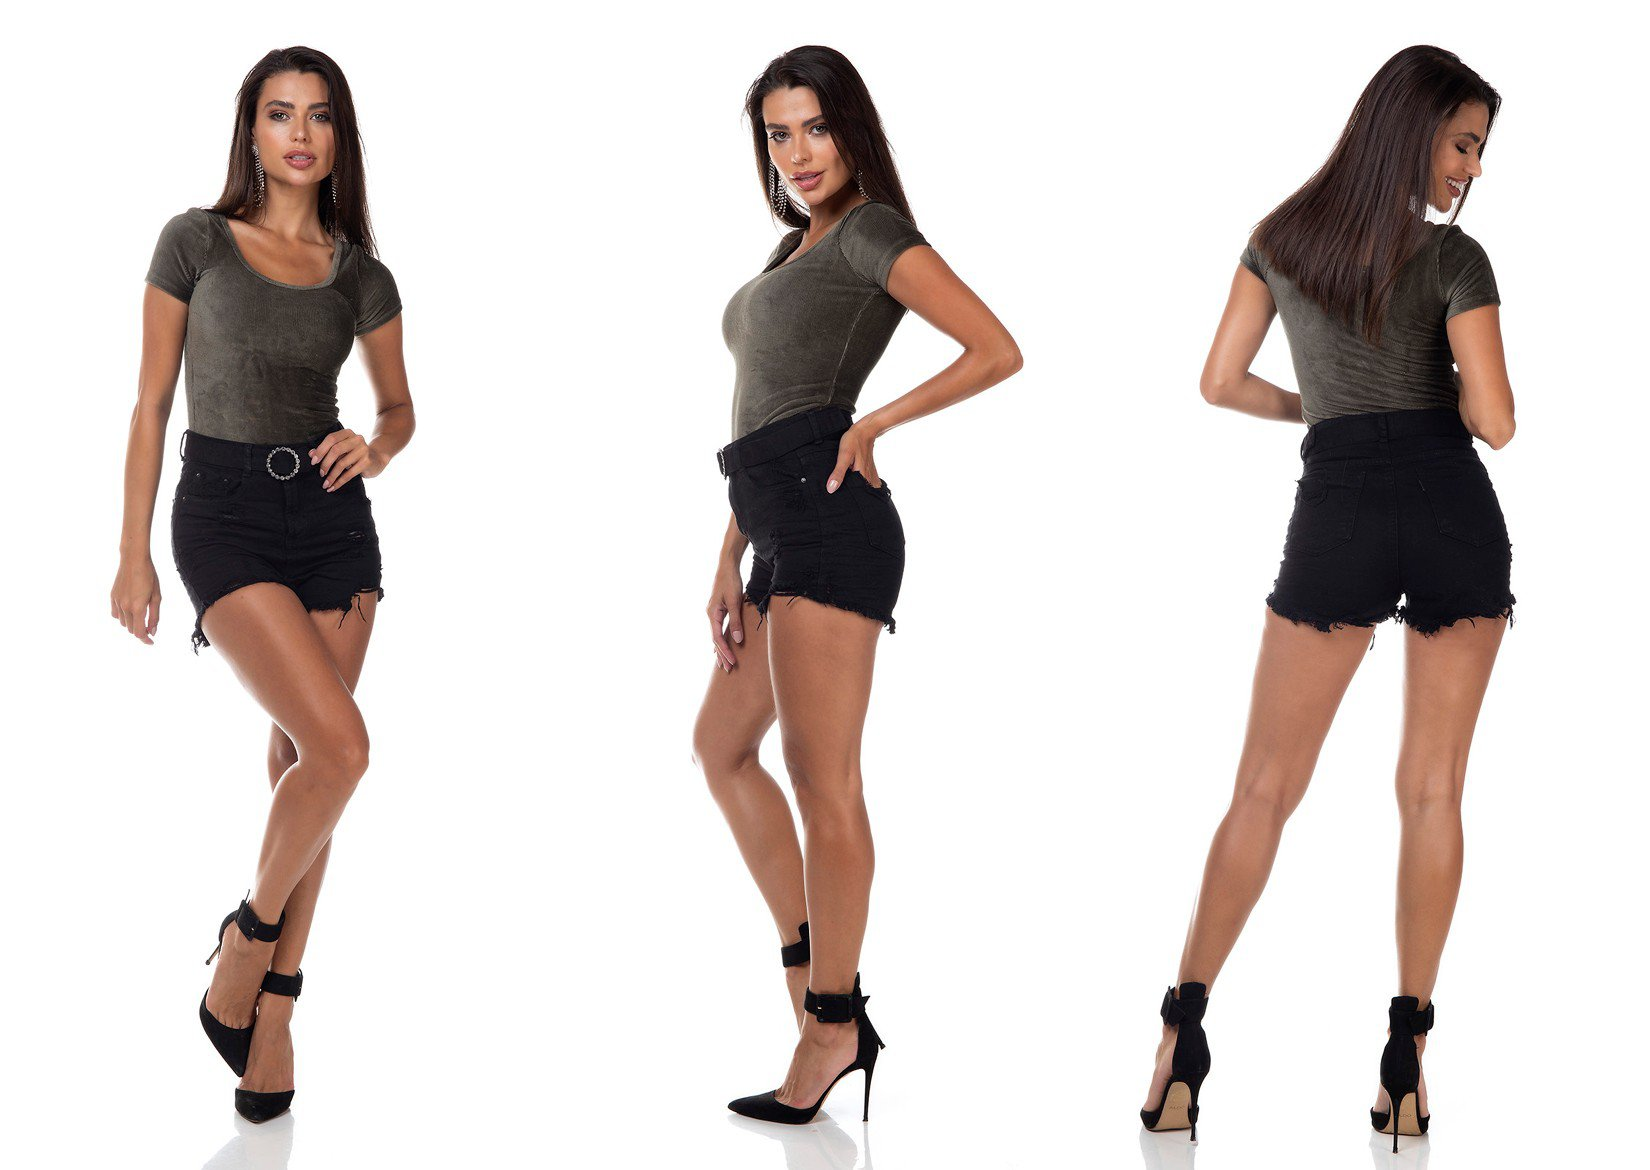 dz6387 shorts jeans feminino setentinha black and white cinto com strass preto denim zero tripla